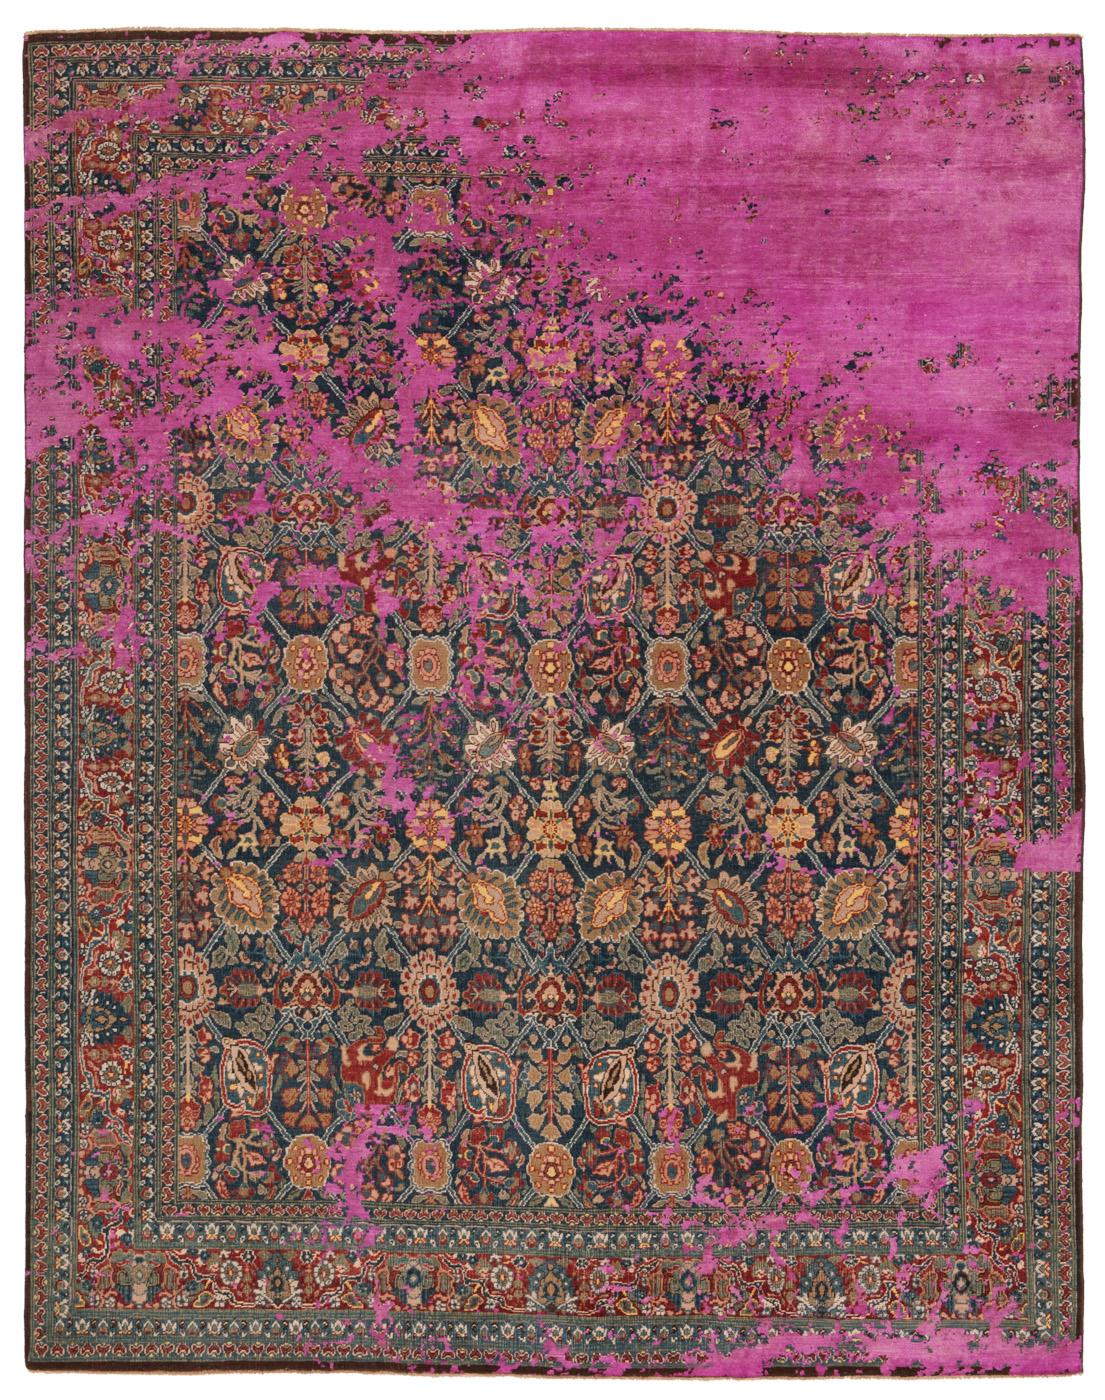 ErasedHeritage_4500159-TabrizCanalRocked_navyblue-neonpinkSilk-194x247cm.jpg